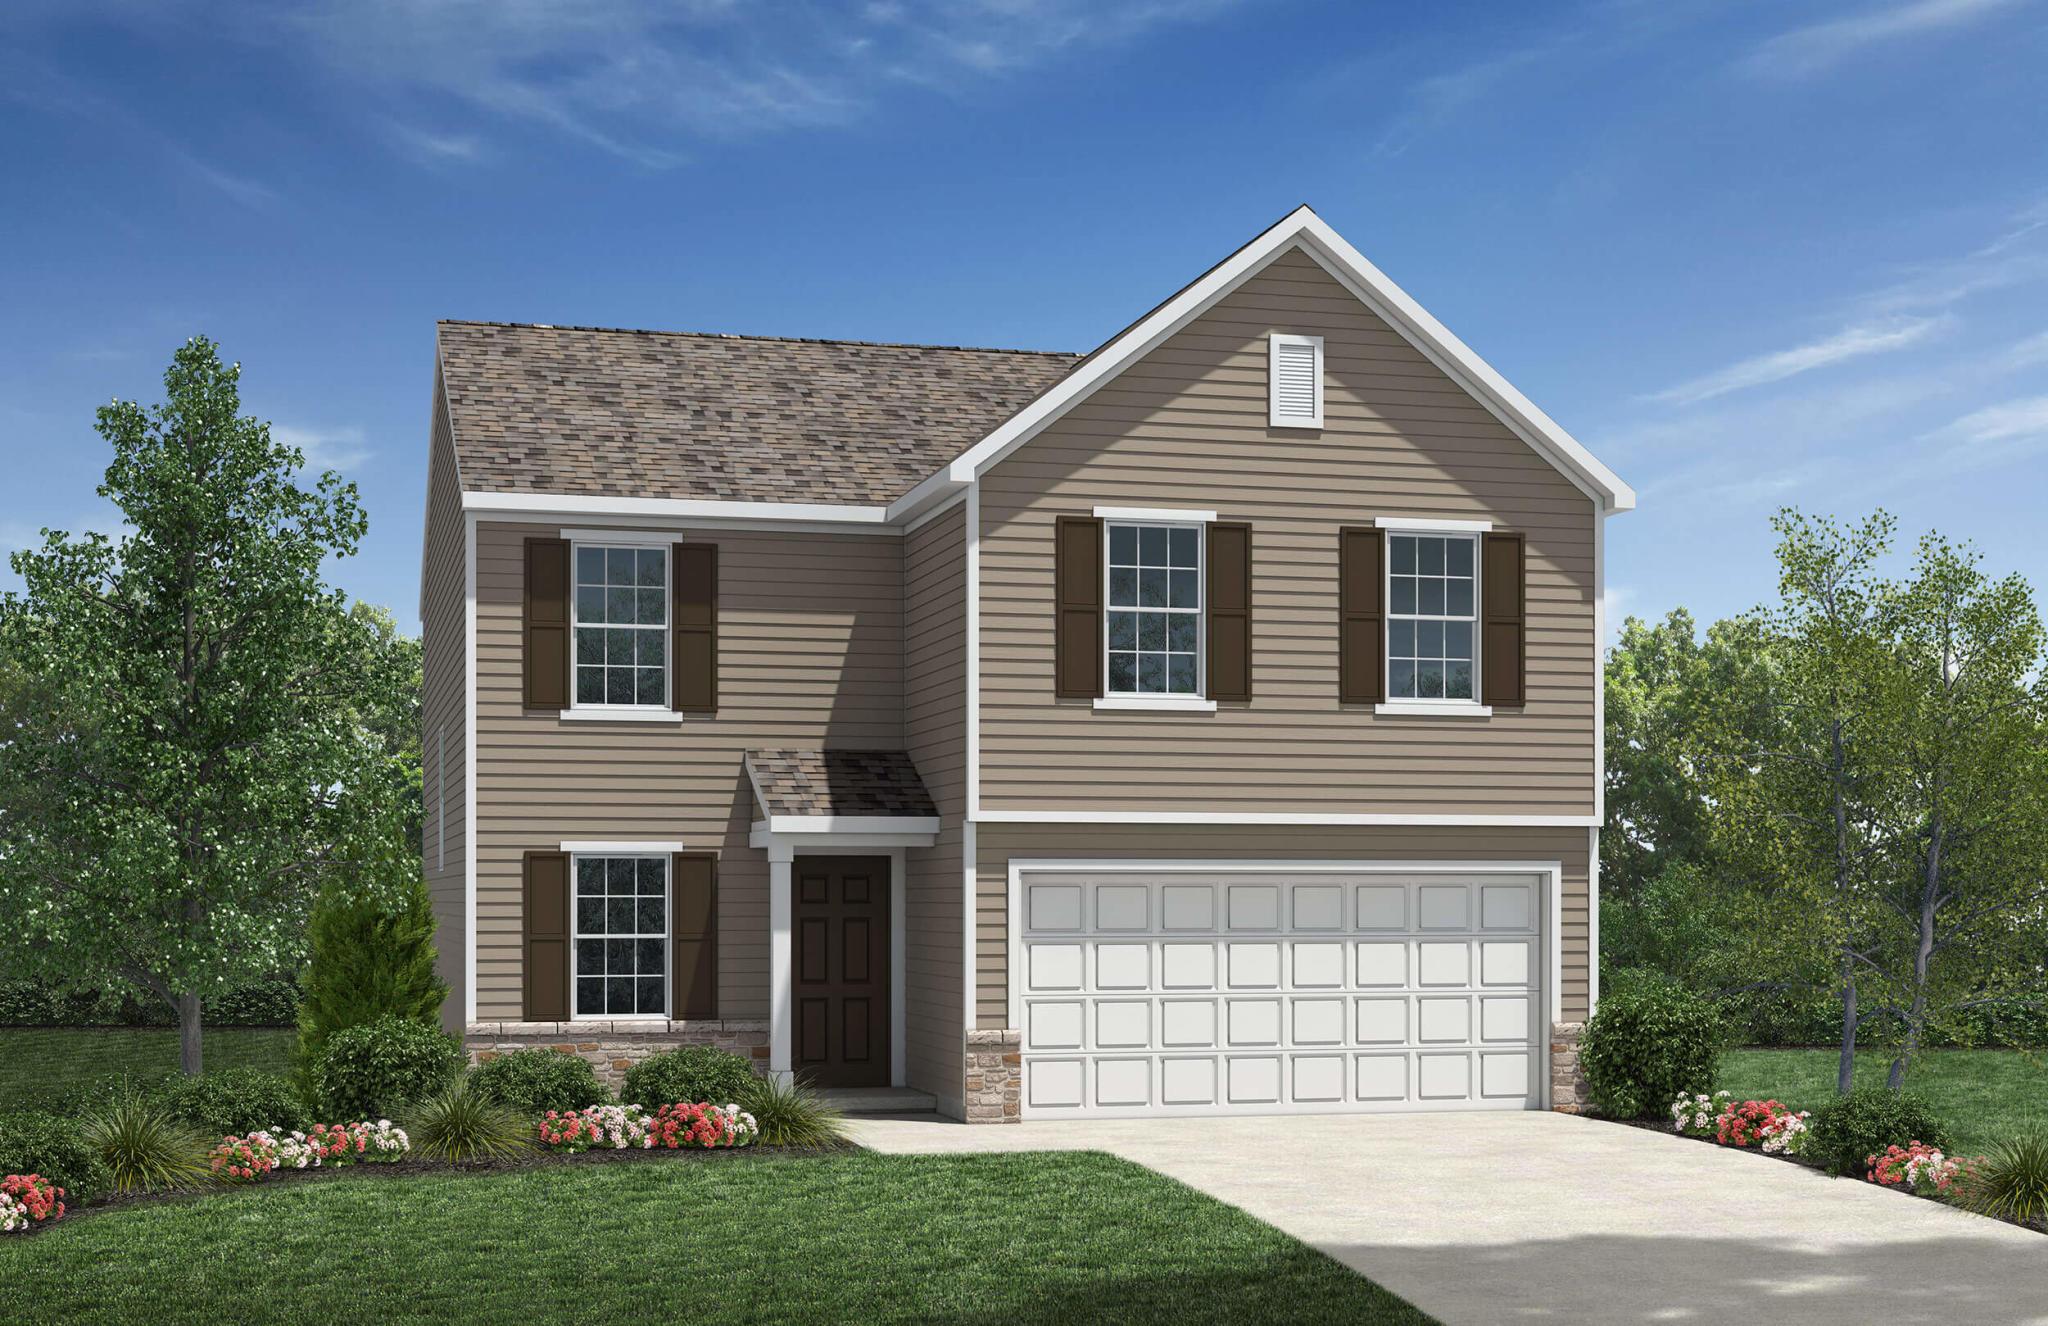 Belmont Plan, Pickerington, OH 43147 - 3 Bed, 2 5 Bath Single-Family Home -  7 Photos | Trulia